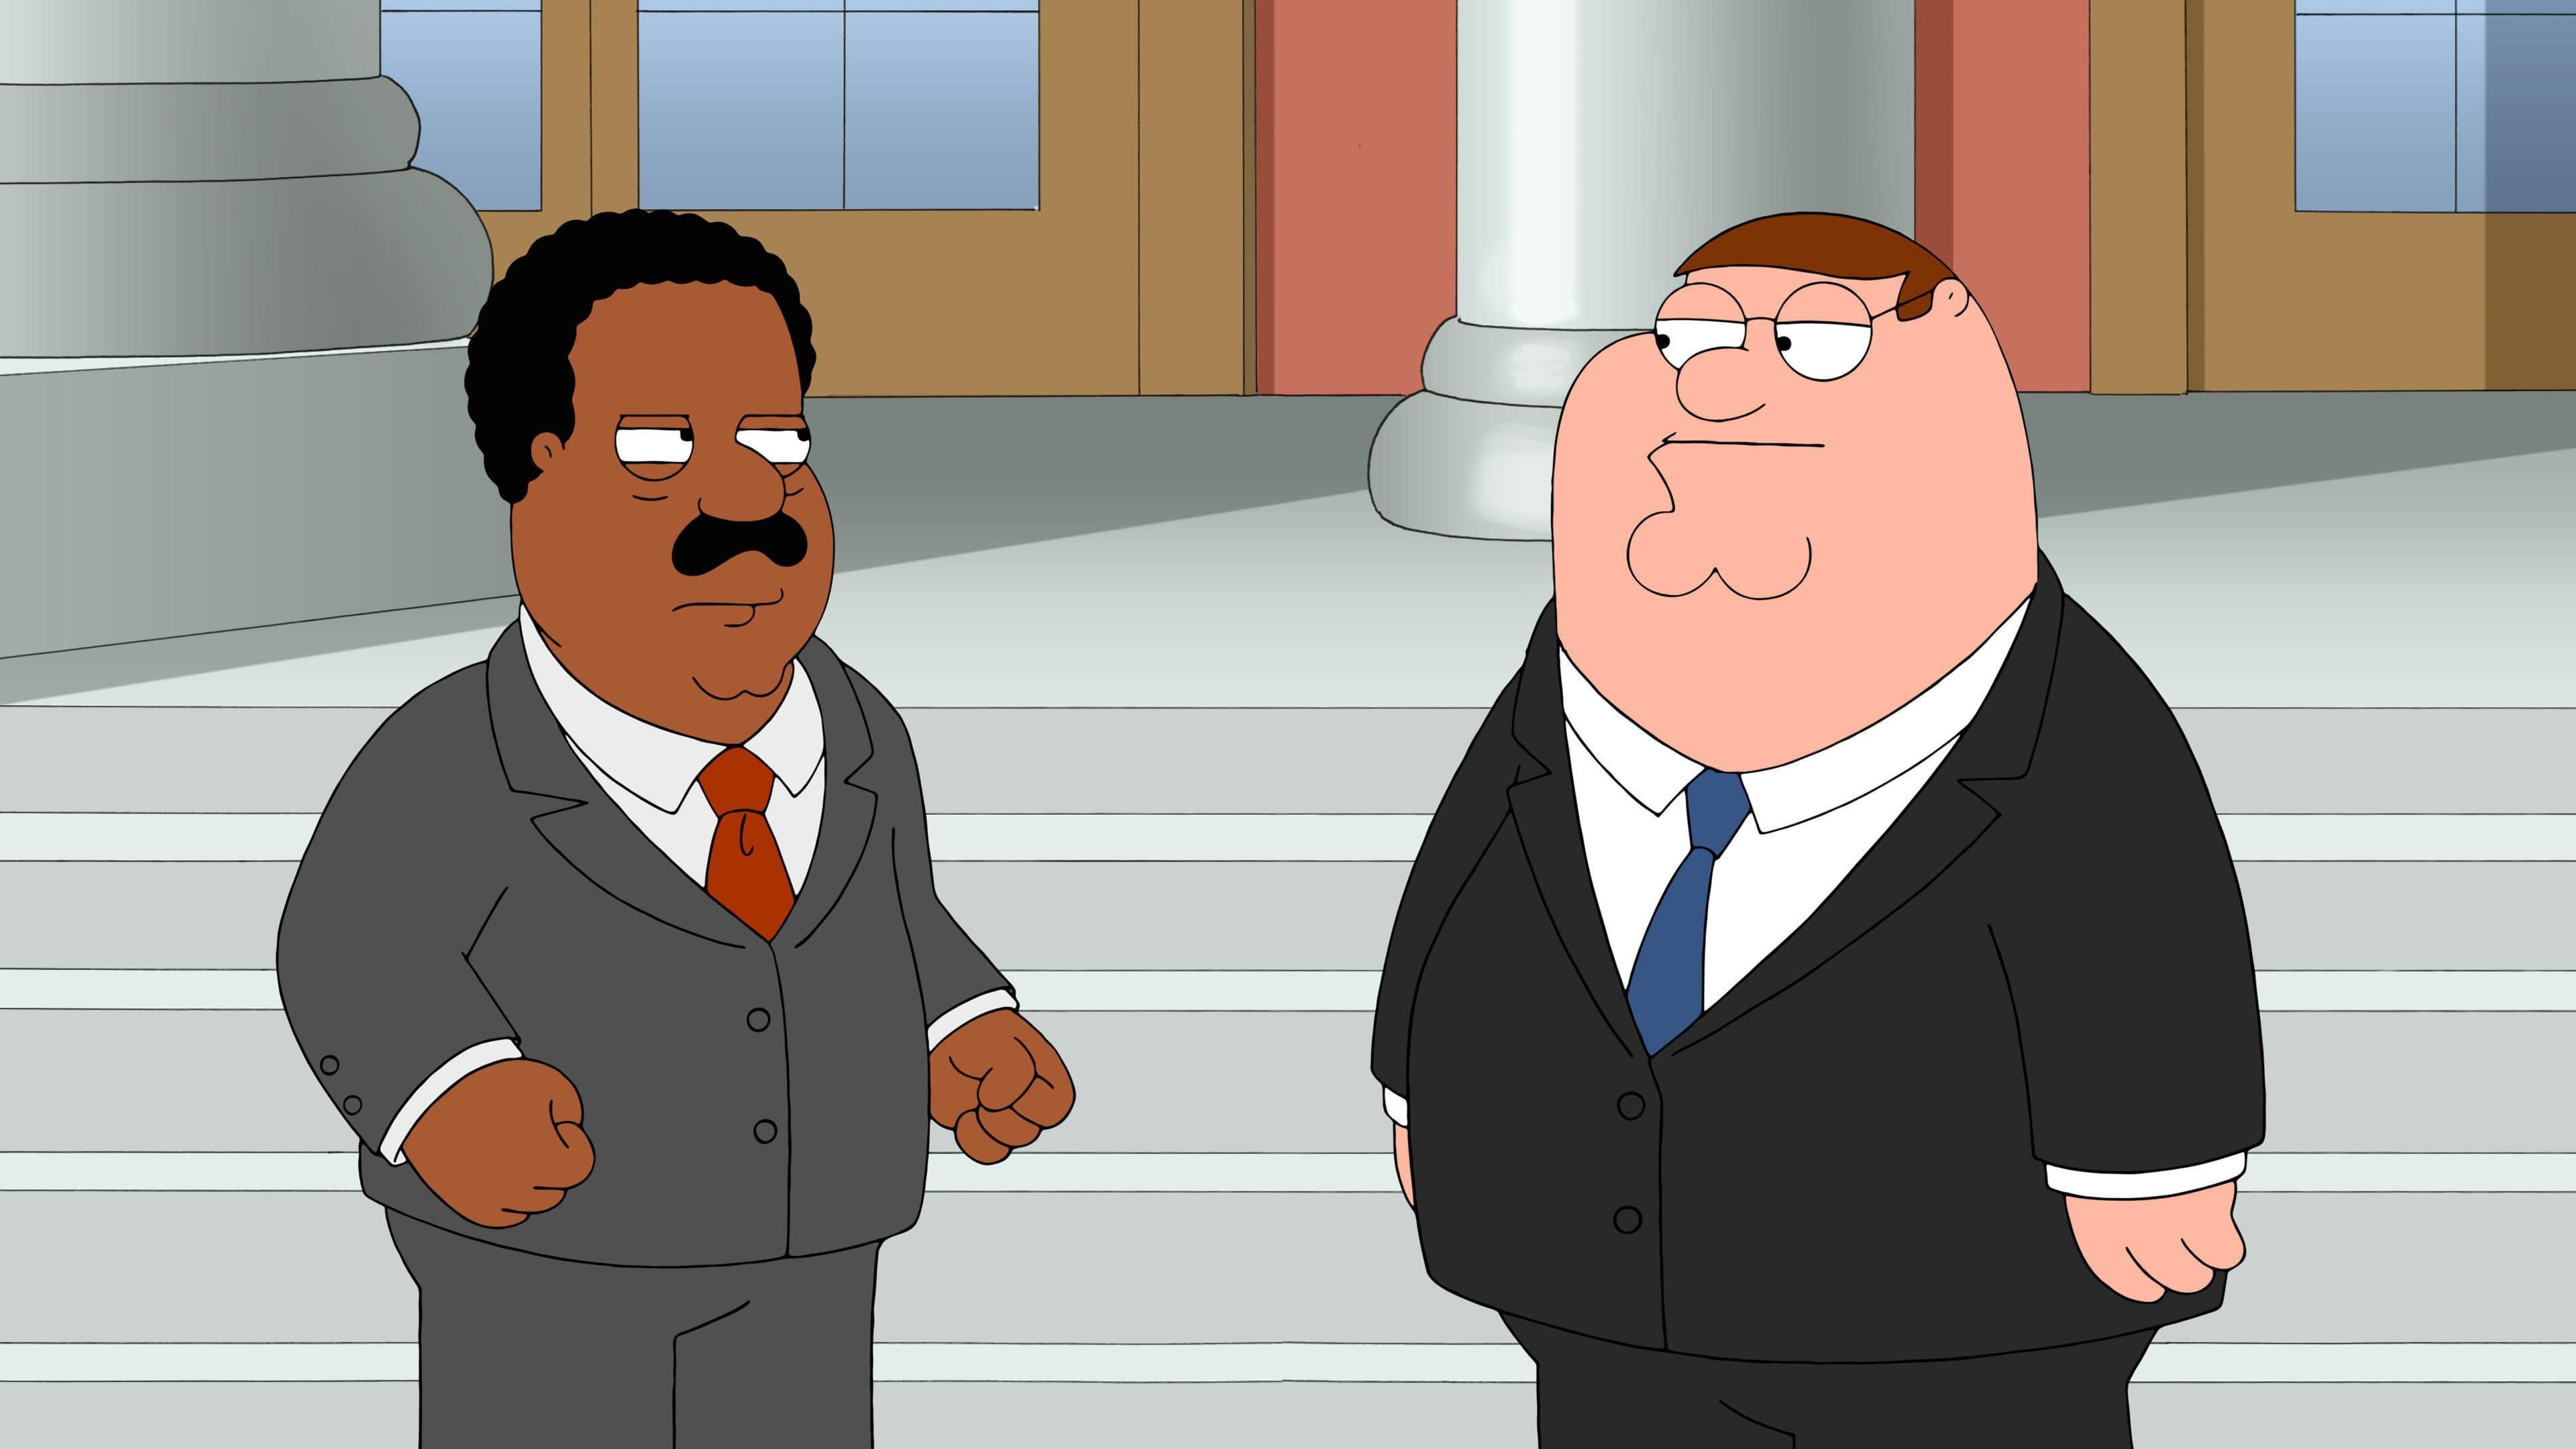 Family Guy Season 14 : A Shot in the Dark